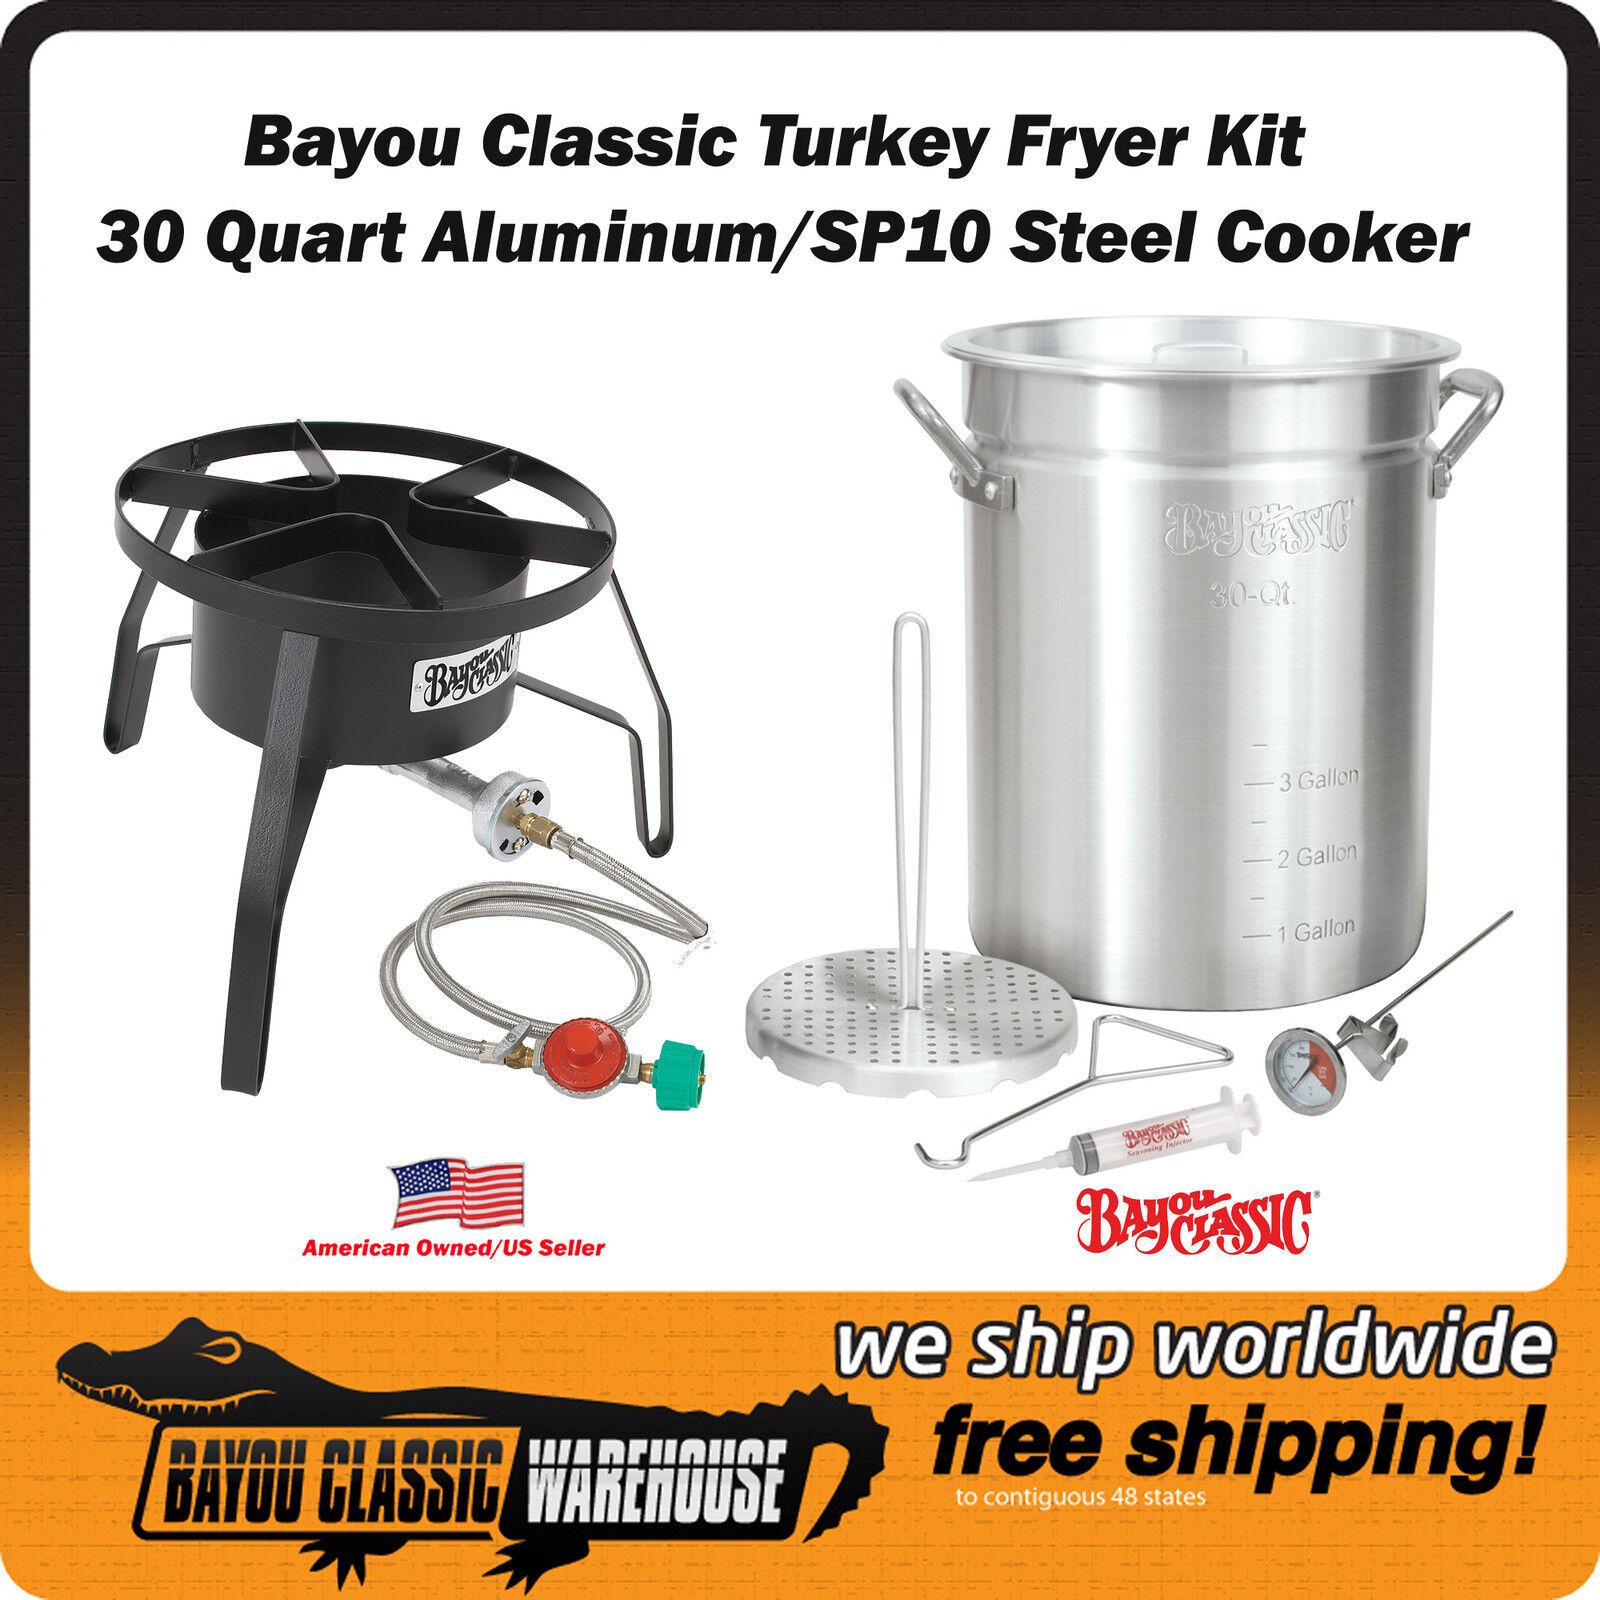 Basic Turkey Fryer Complete Kit 30 Quart Aluminum Pot met SP10 Steel Cooker